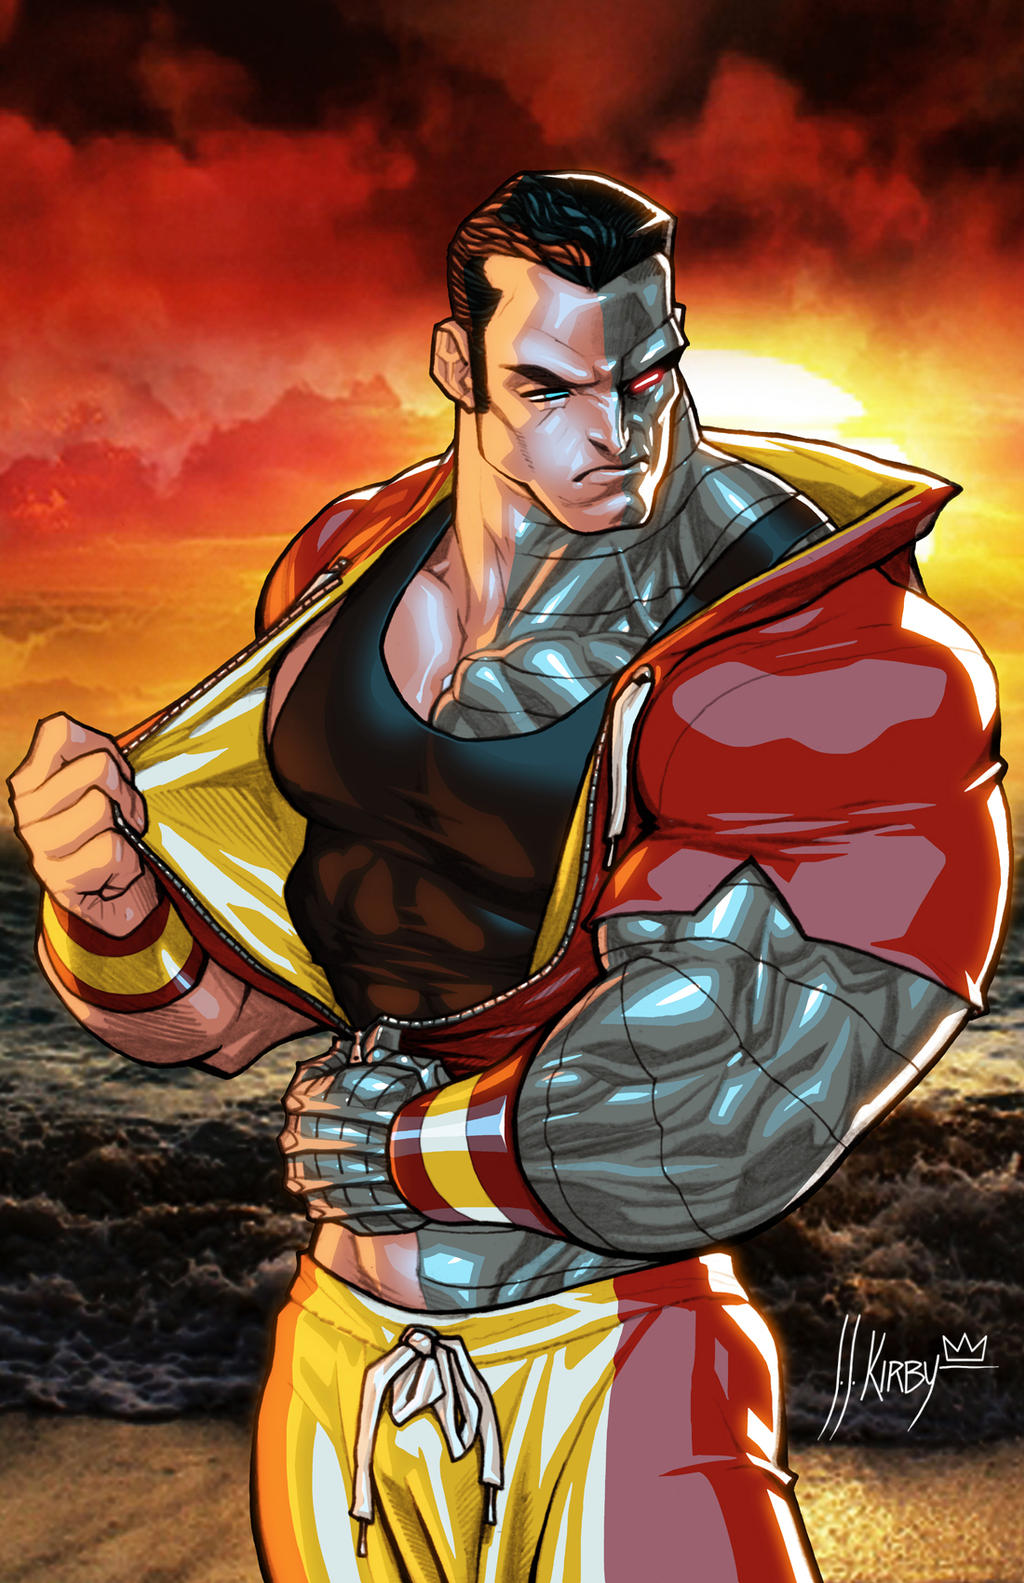 colossus marvel x men - photo #23